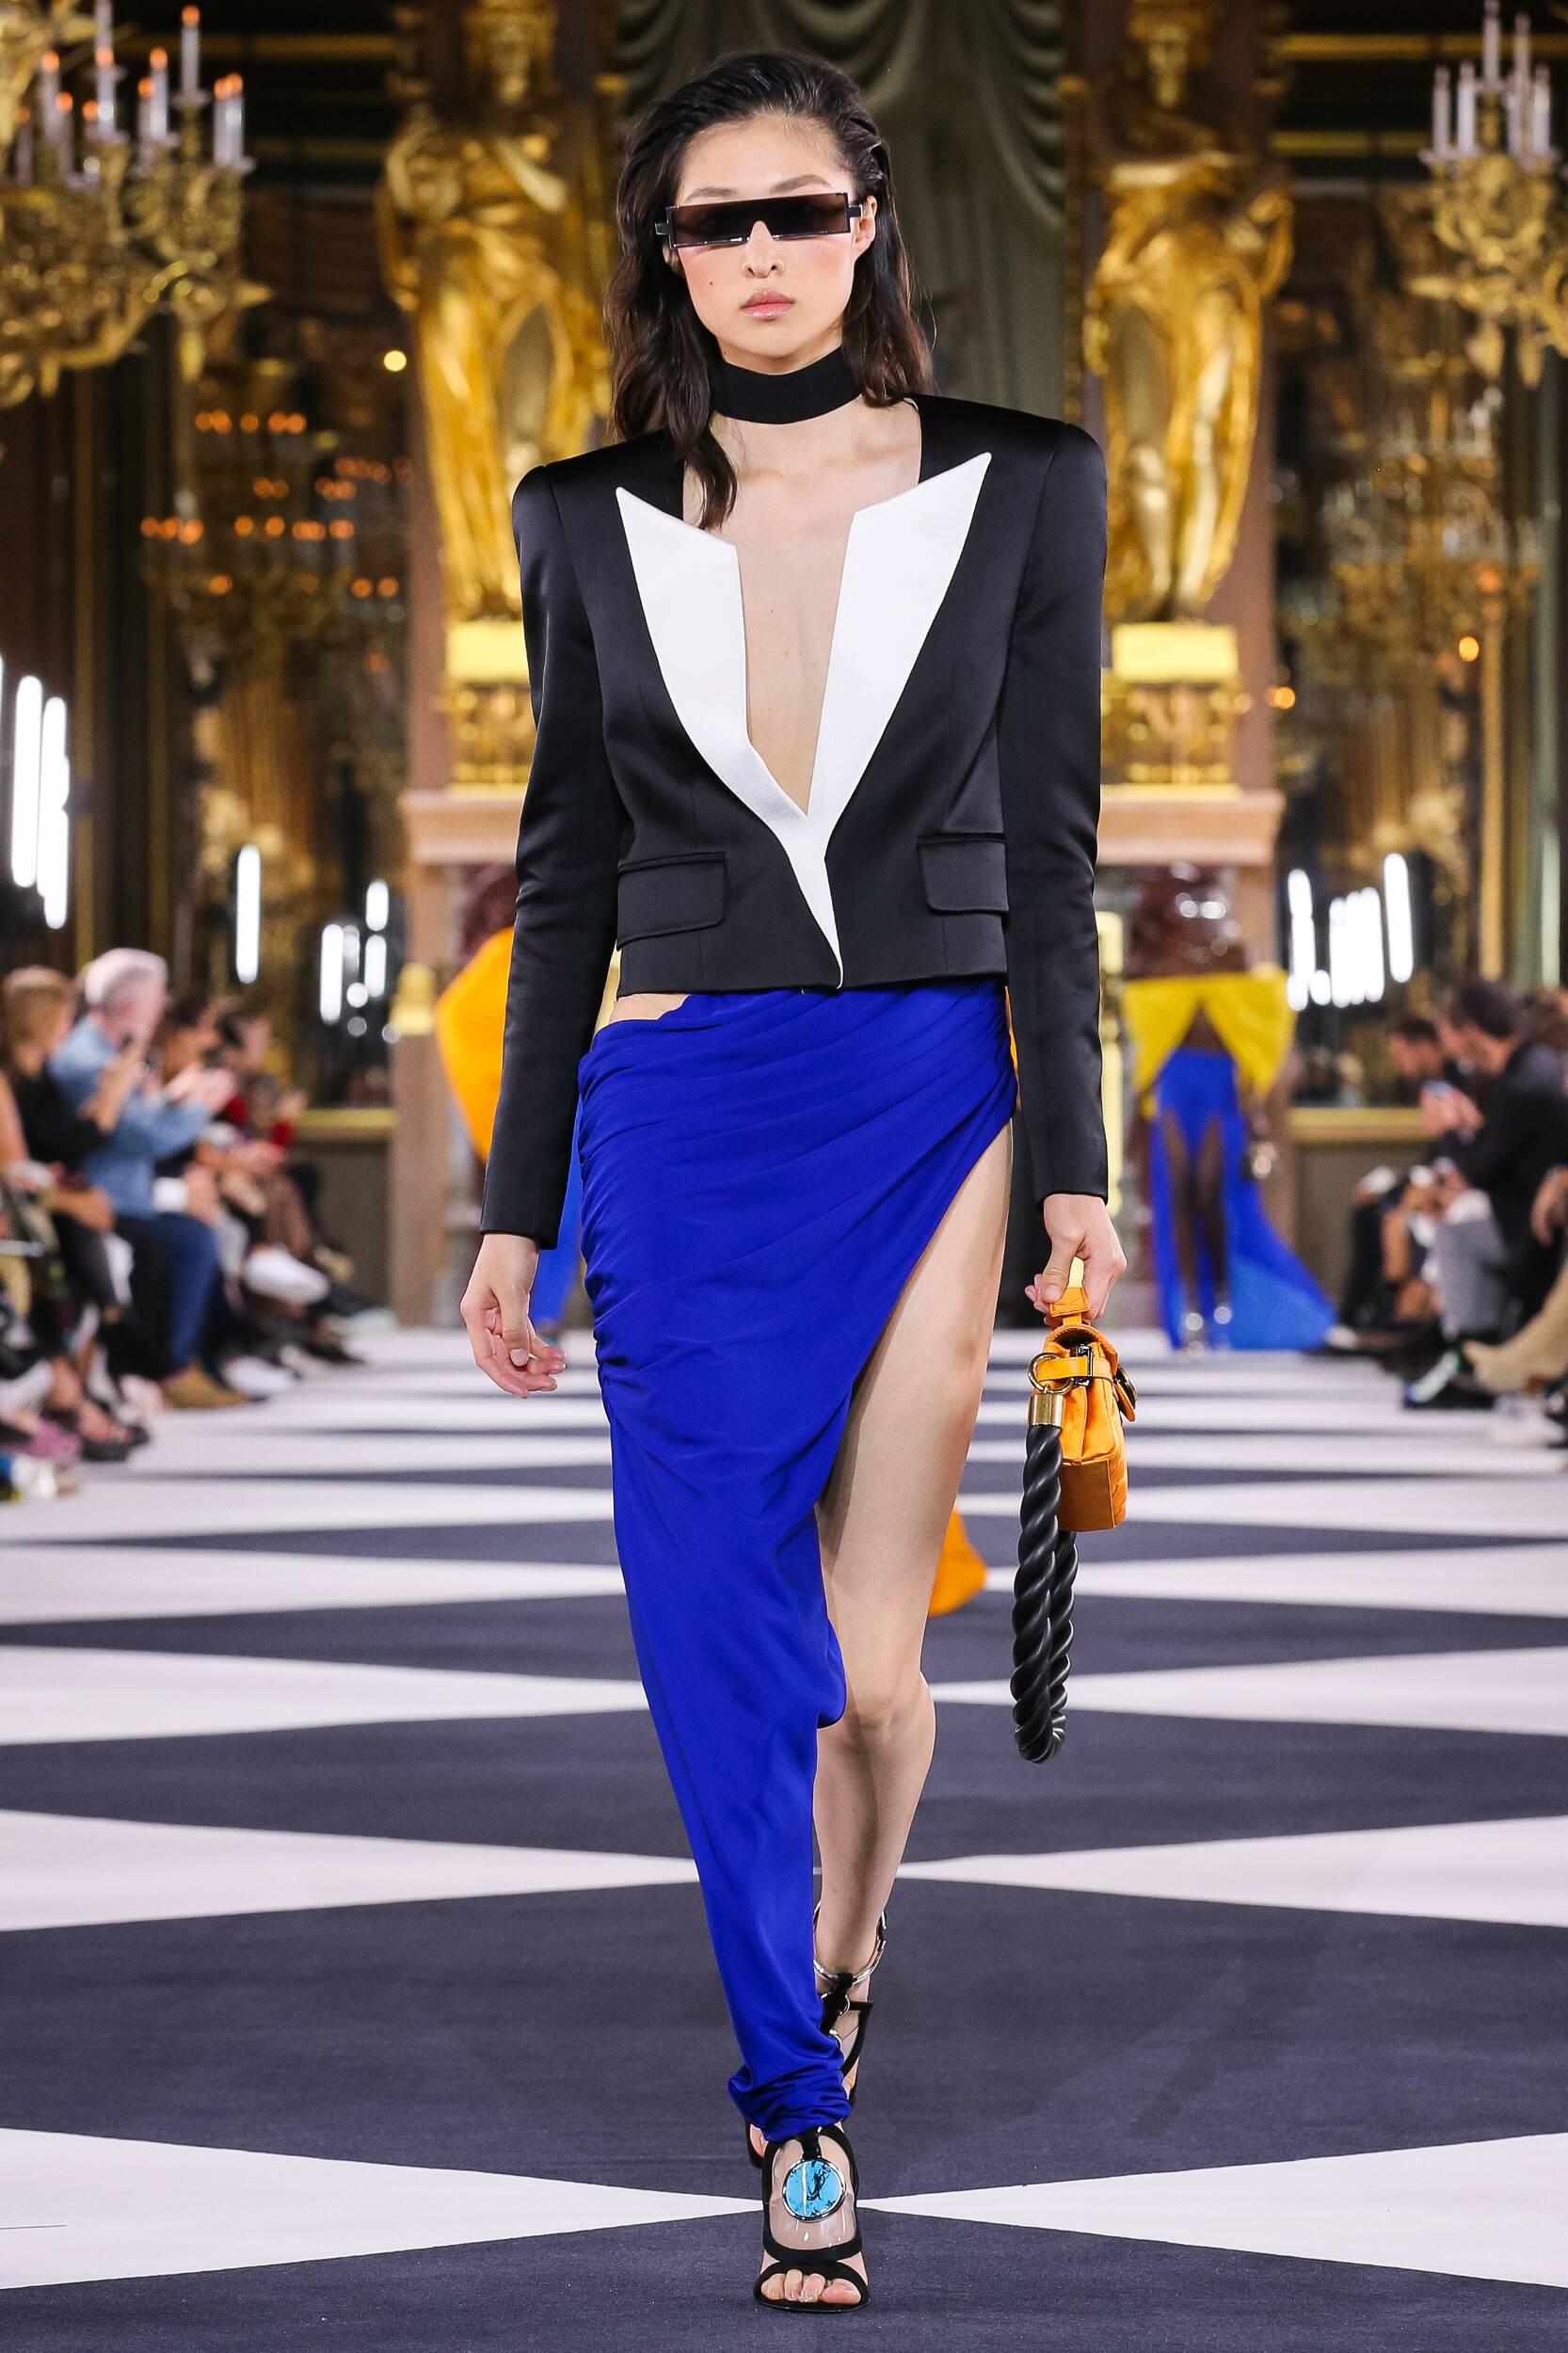 Spring Summer Fashion Trends 2020 Balmain